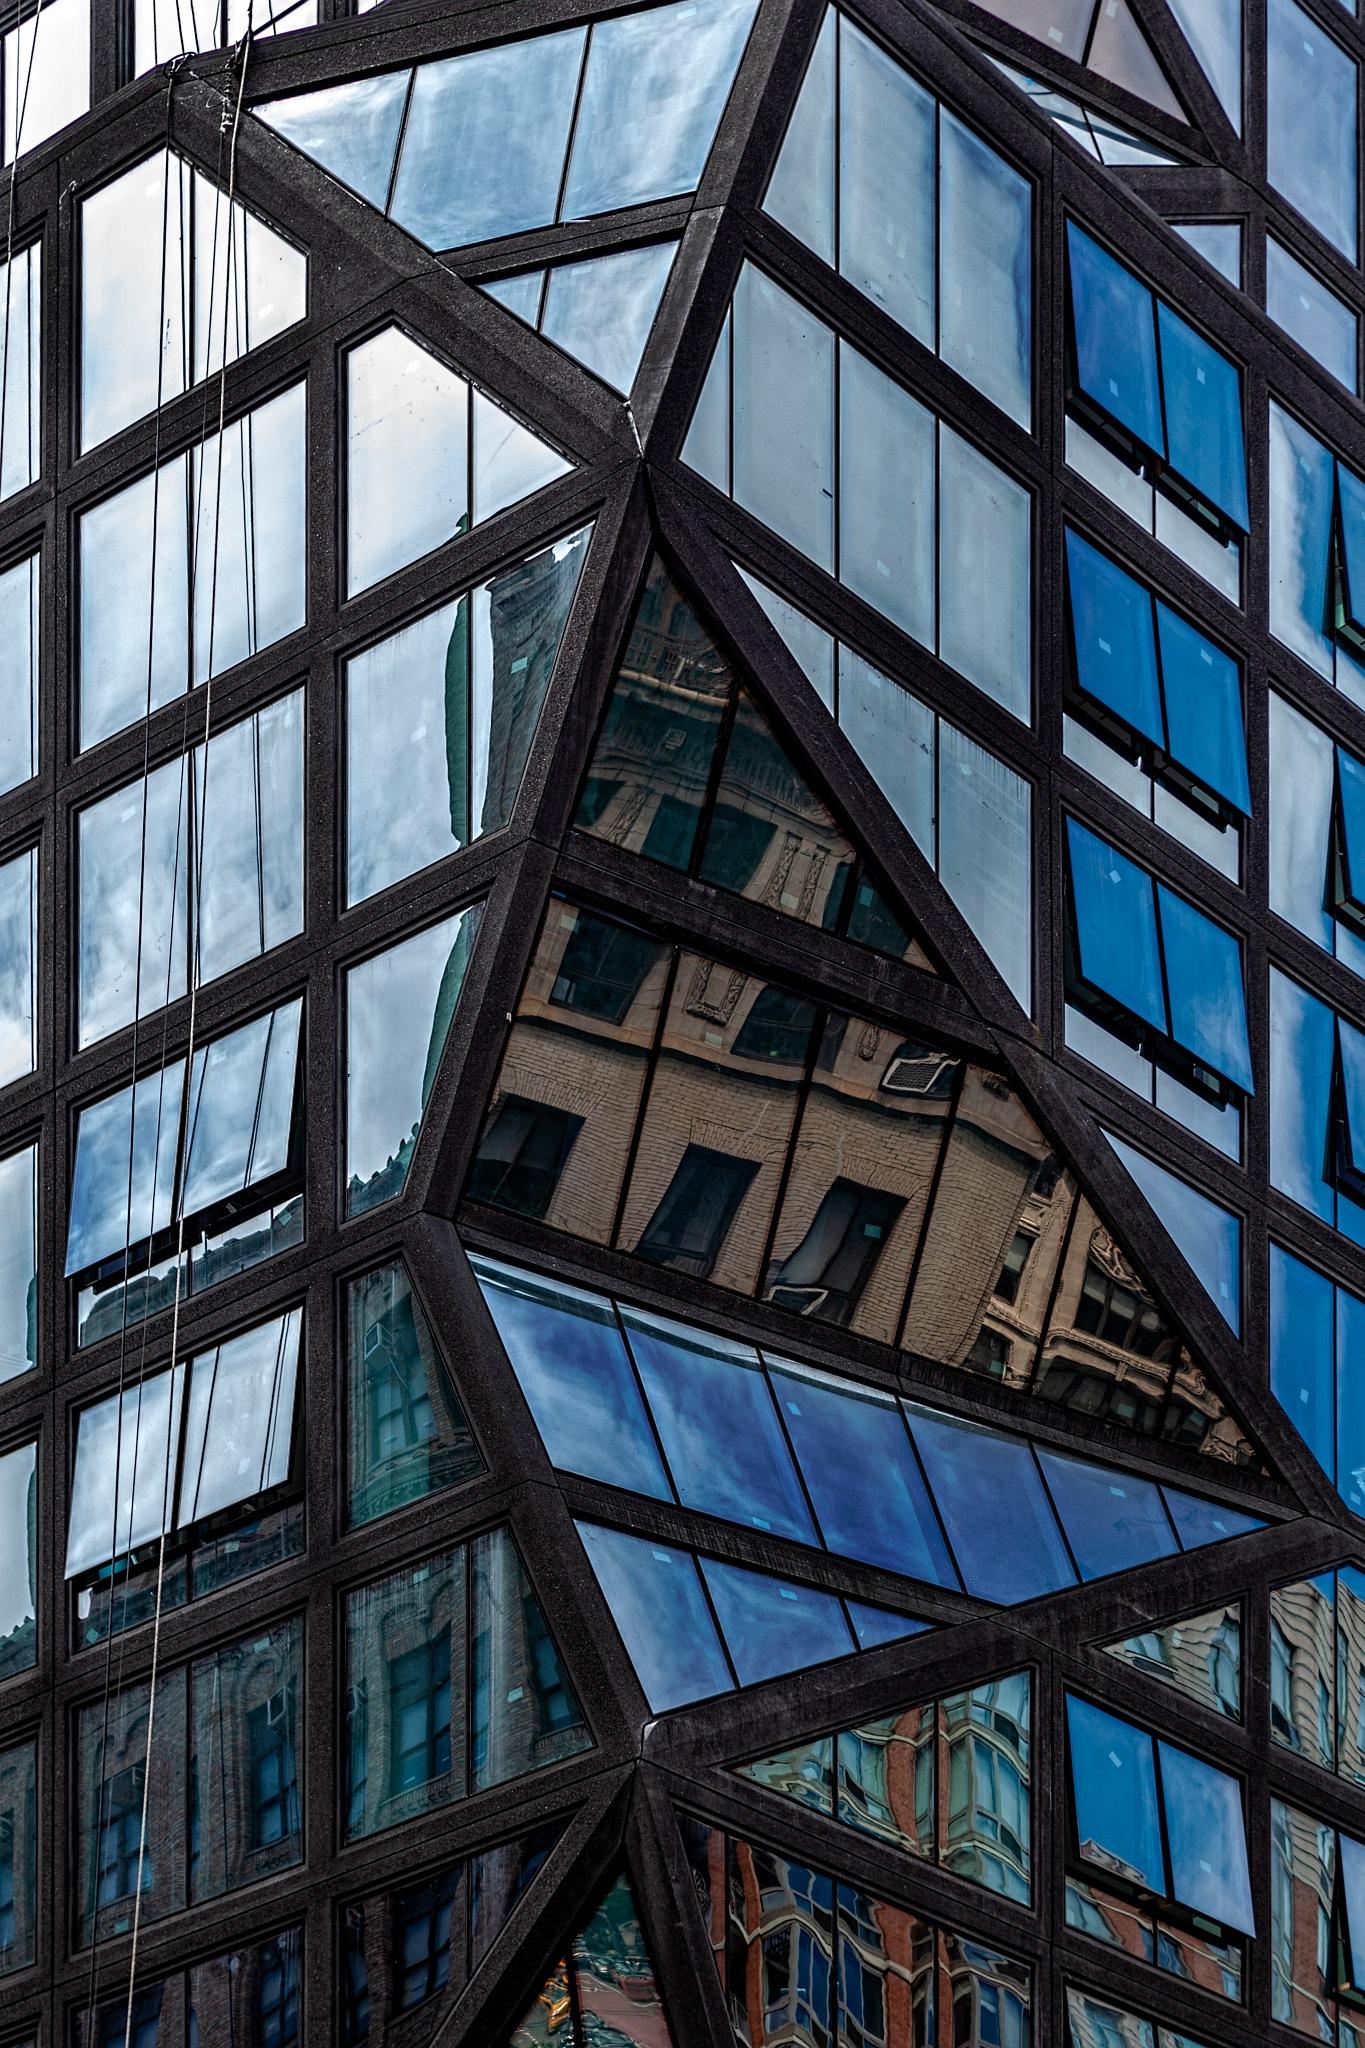 Reflective Architecture by robertullmann